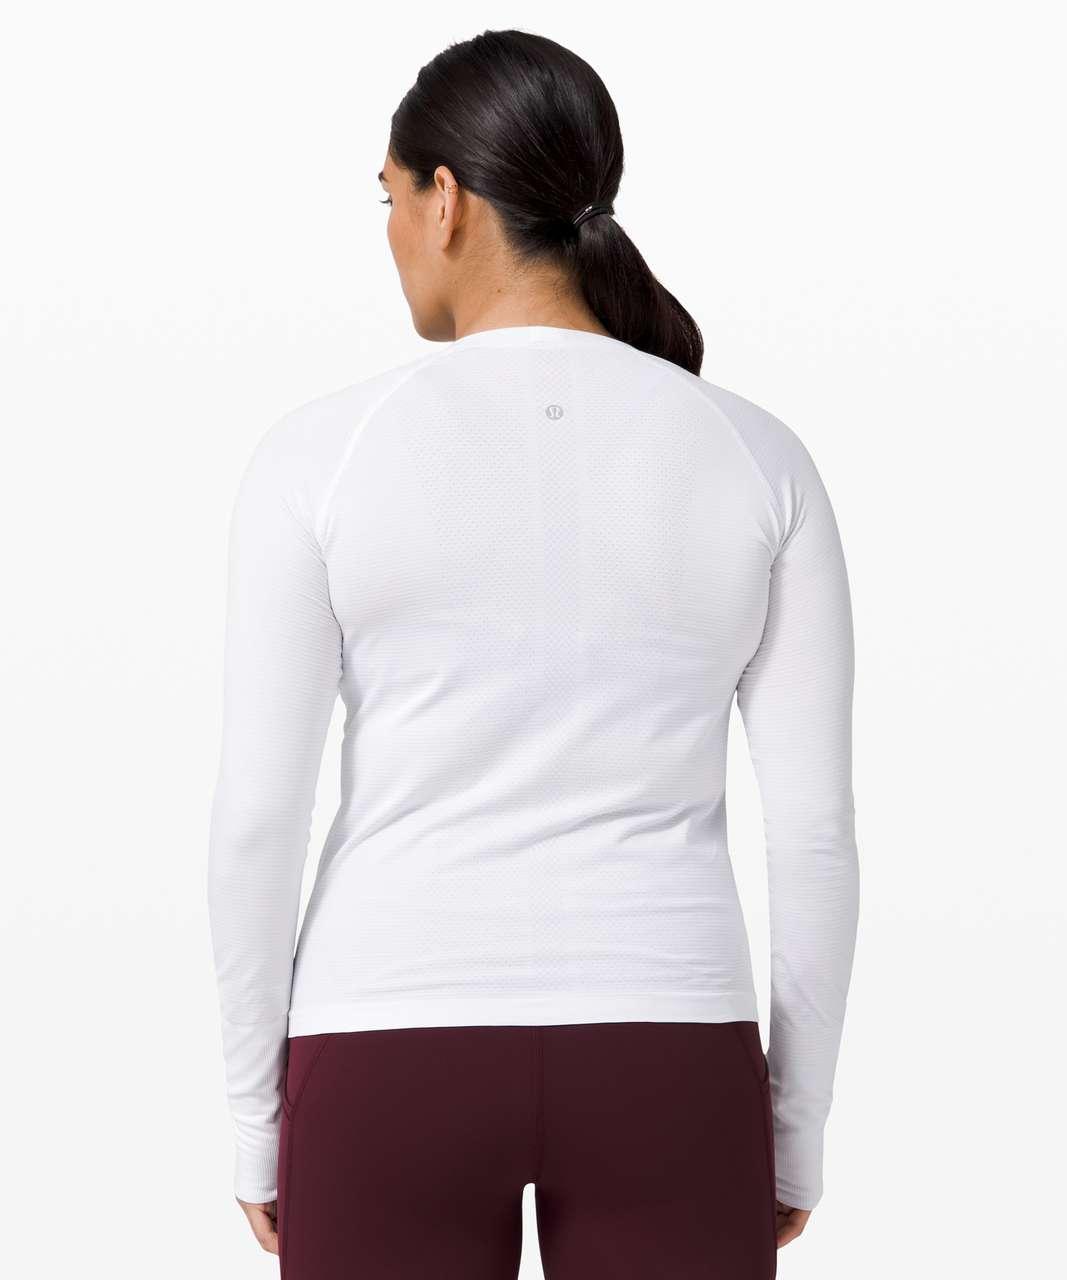 Lululemon Swiftly Tech Long Sleeve 2.0 *Race Length - White / White (First Release)